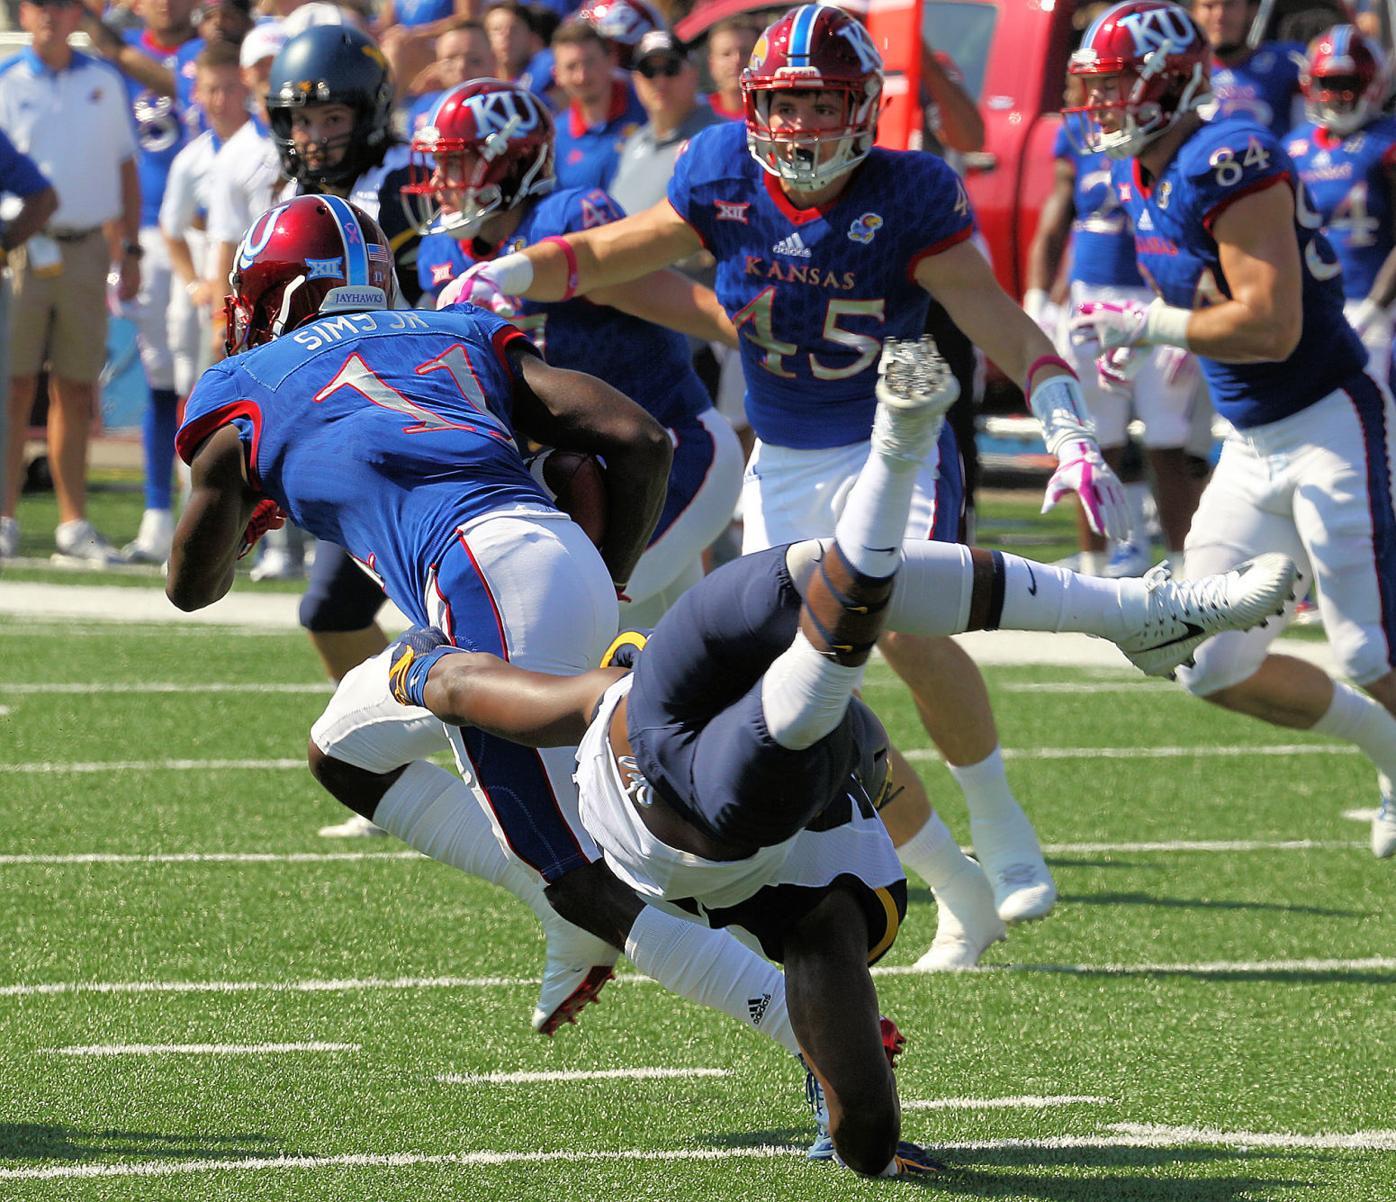 WVU's Quondarius Qualls tries to stop Kansas receiver Steven Sims